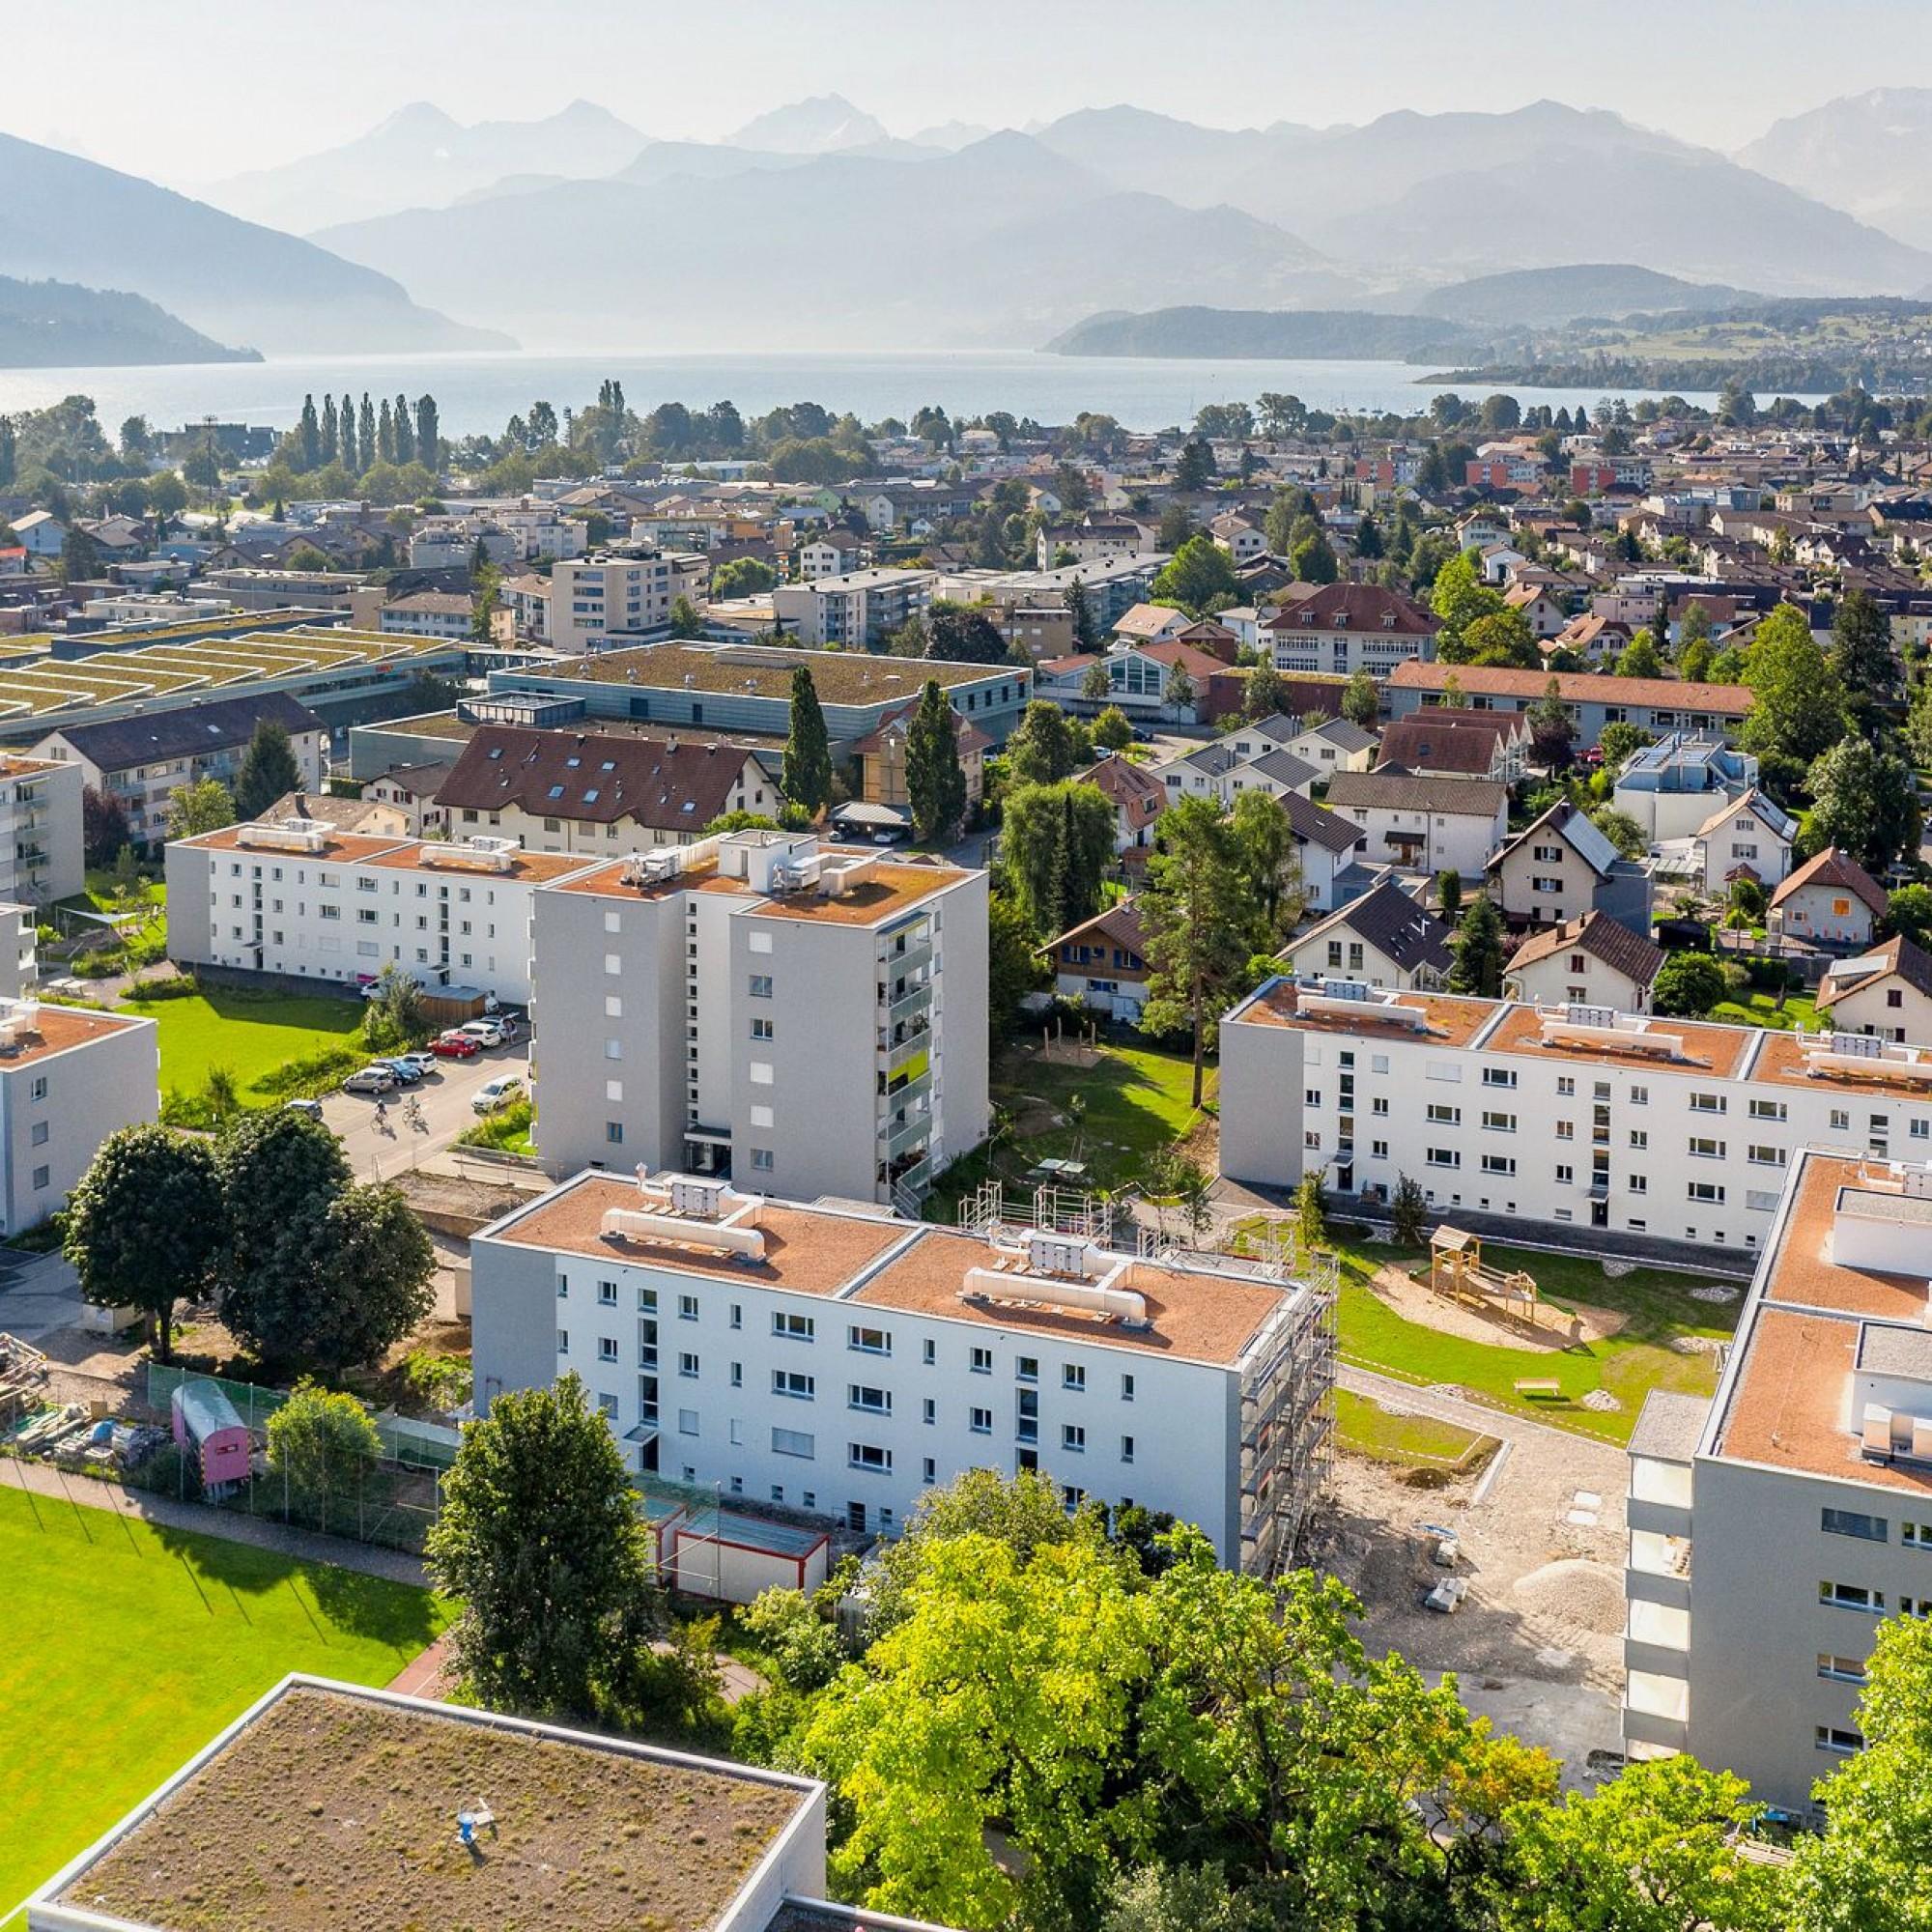 Wohnsiedlung am Meisenweg in Thun, Bern